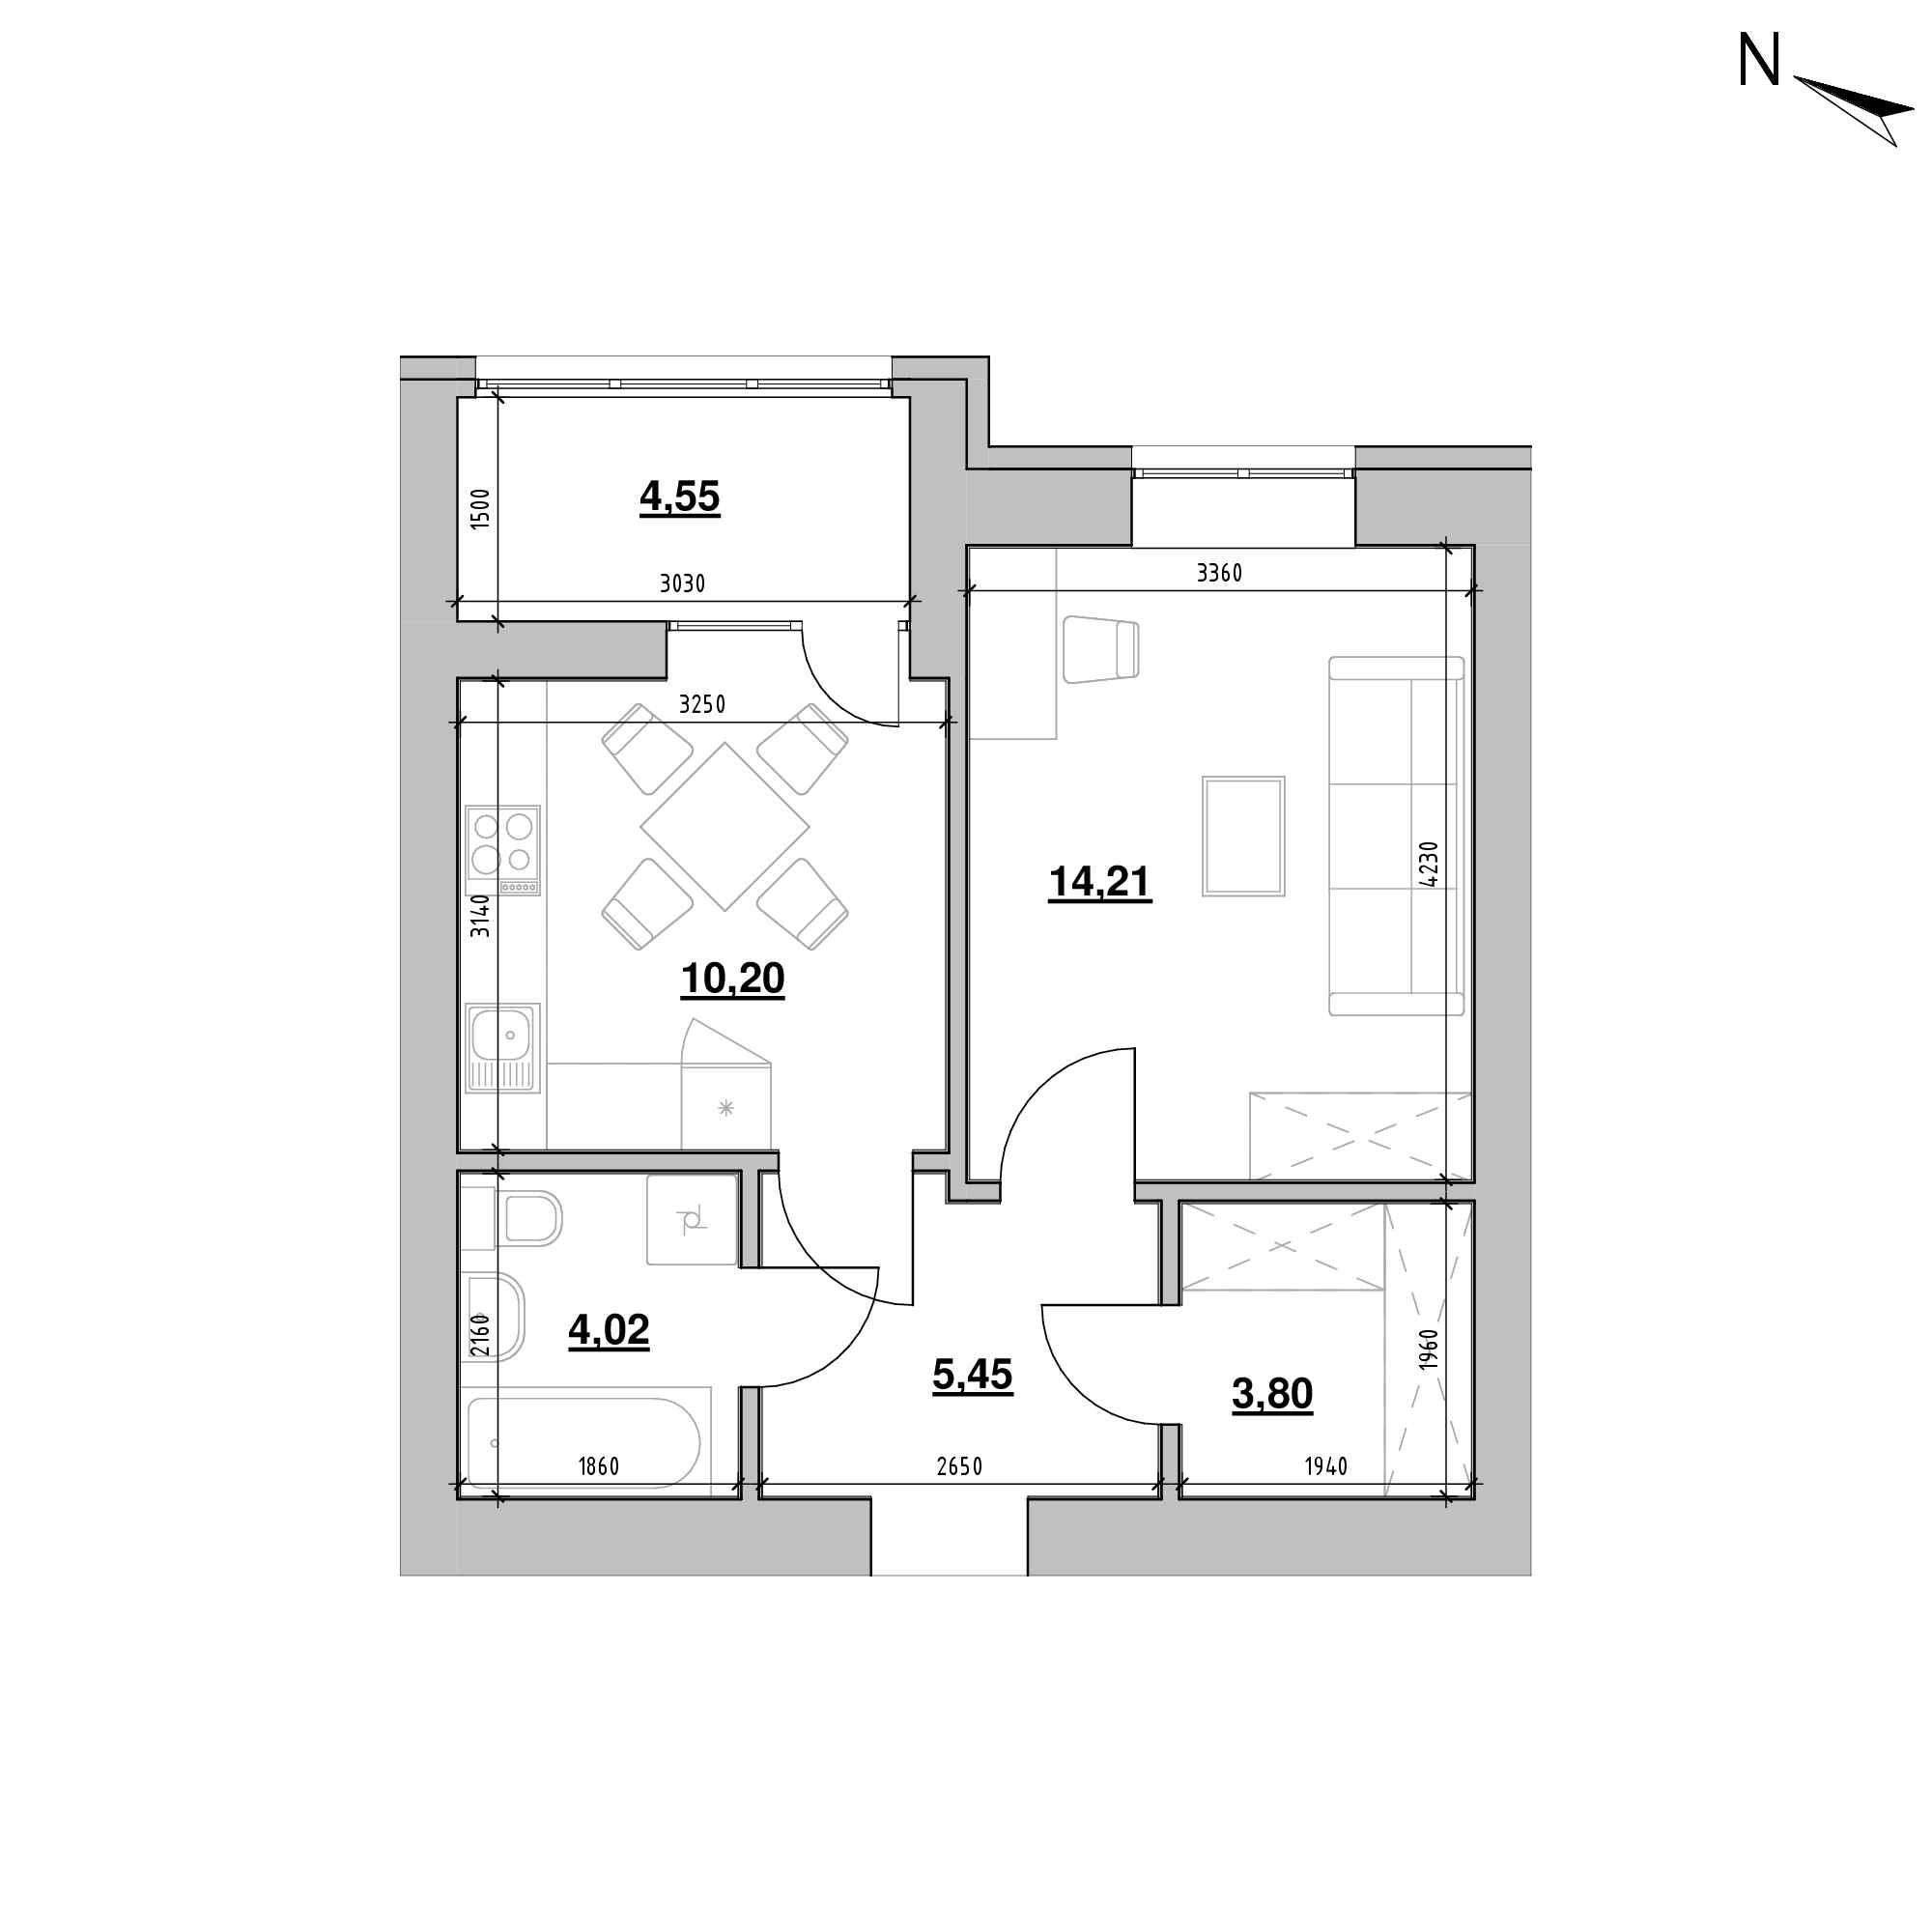 ЖК Шенген: планування 1-кімнатної квартири, №31, 42.23 м<sup>2</sup>